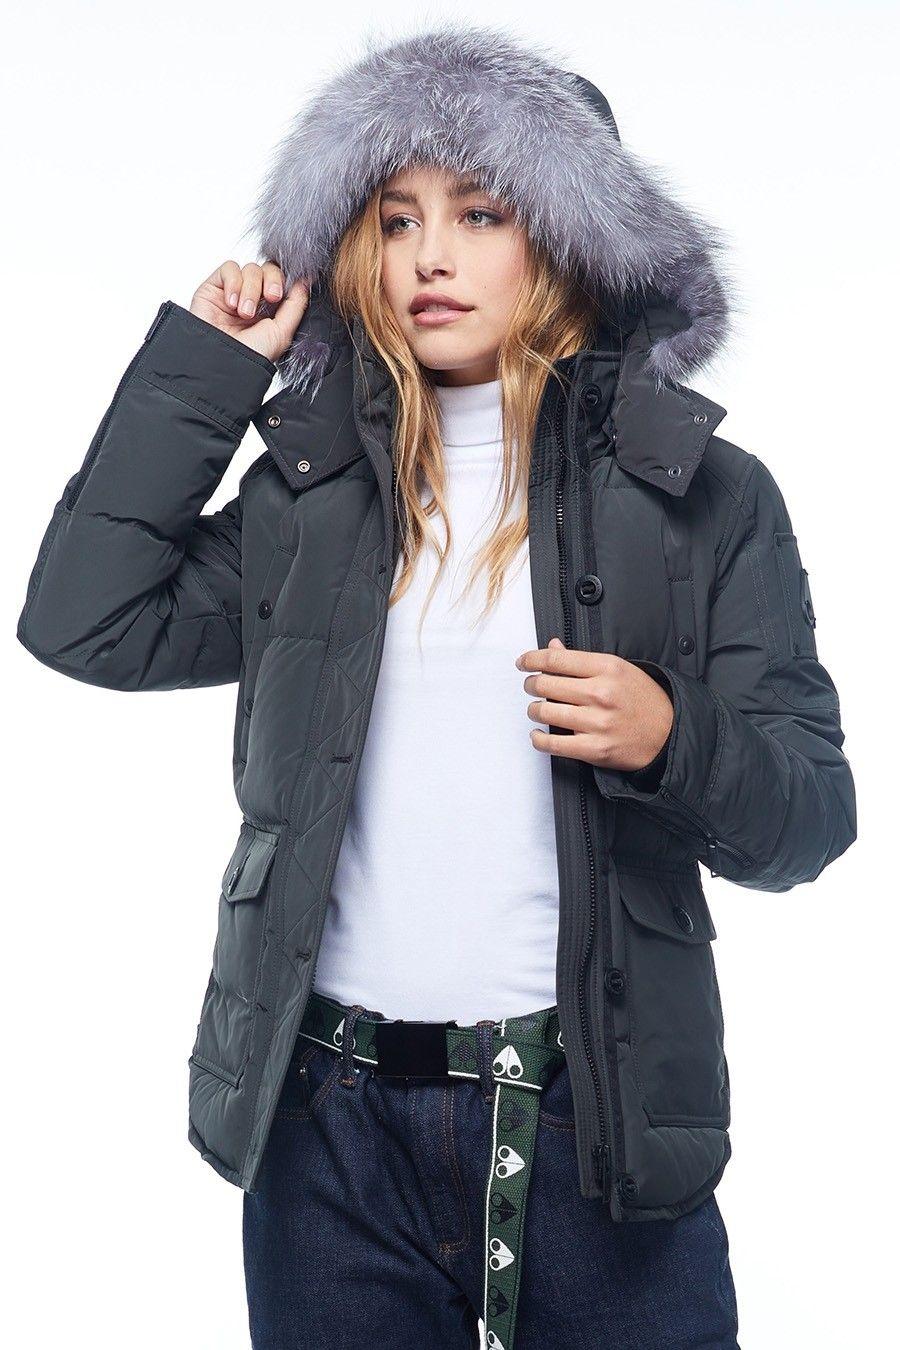 213 Mc Gallery Winter Jackets Jackets Spring Coat [ 1350 x 900 Pixel ]